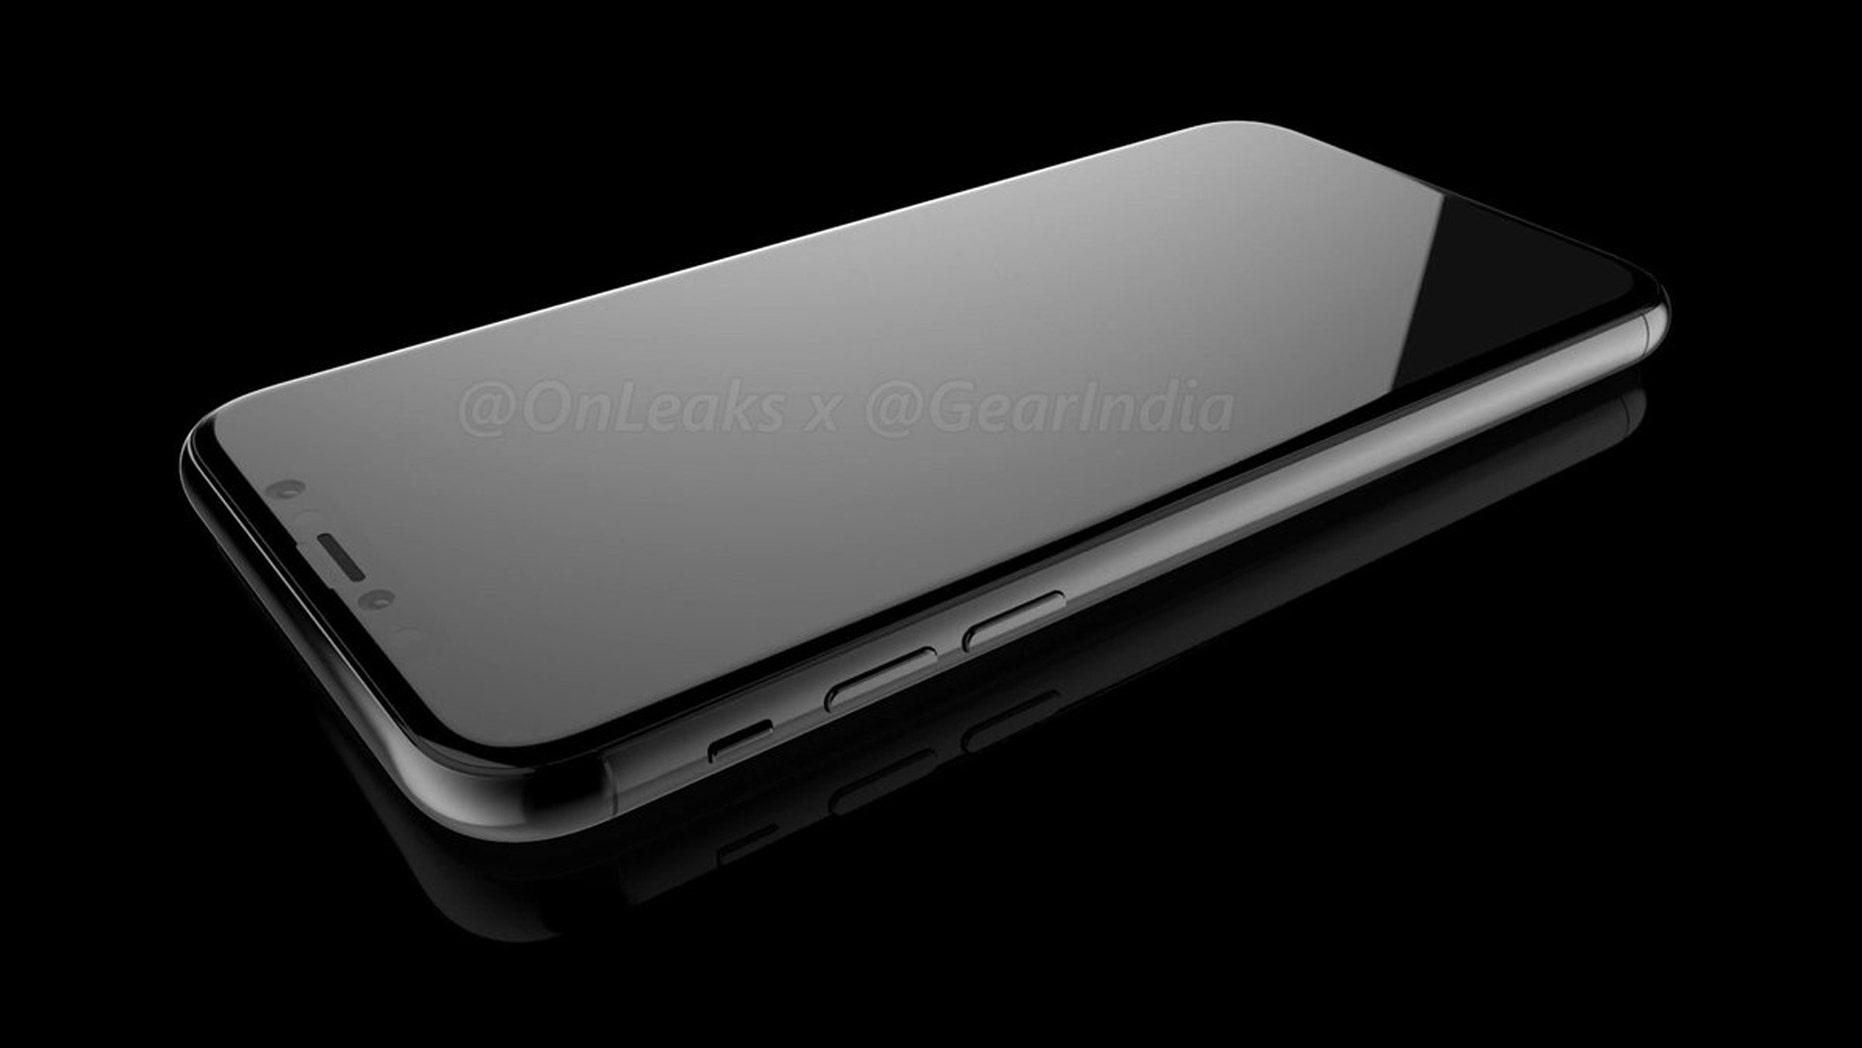 (An artist's rendering of the next iPhone. Credit: Steve Hemmerstoffer, OnLeaks)